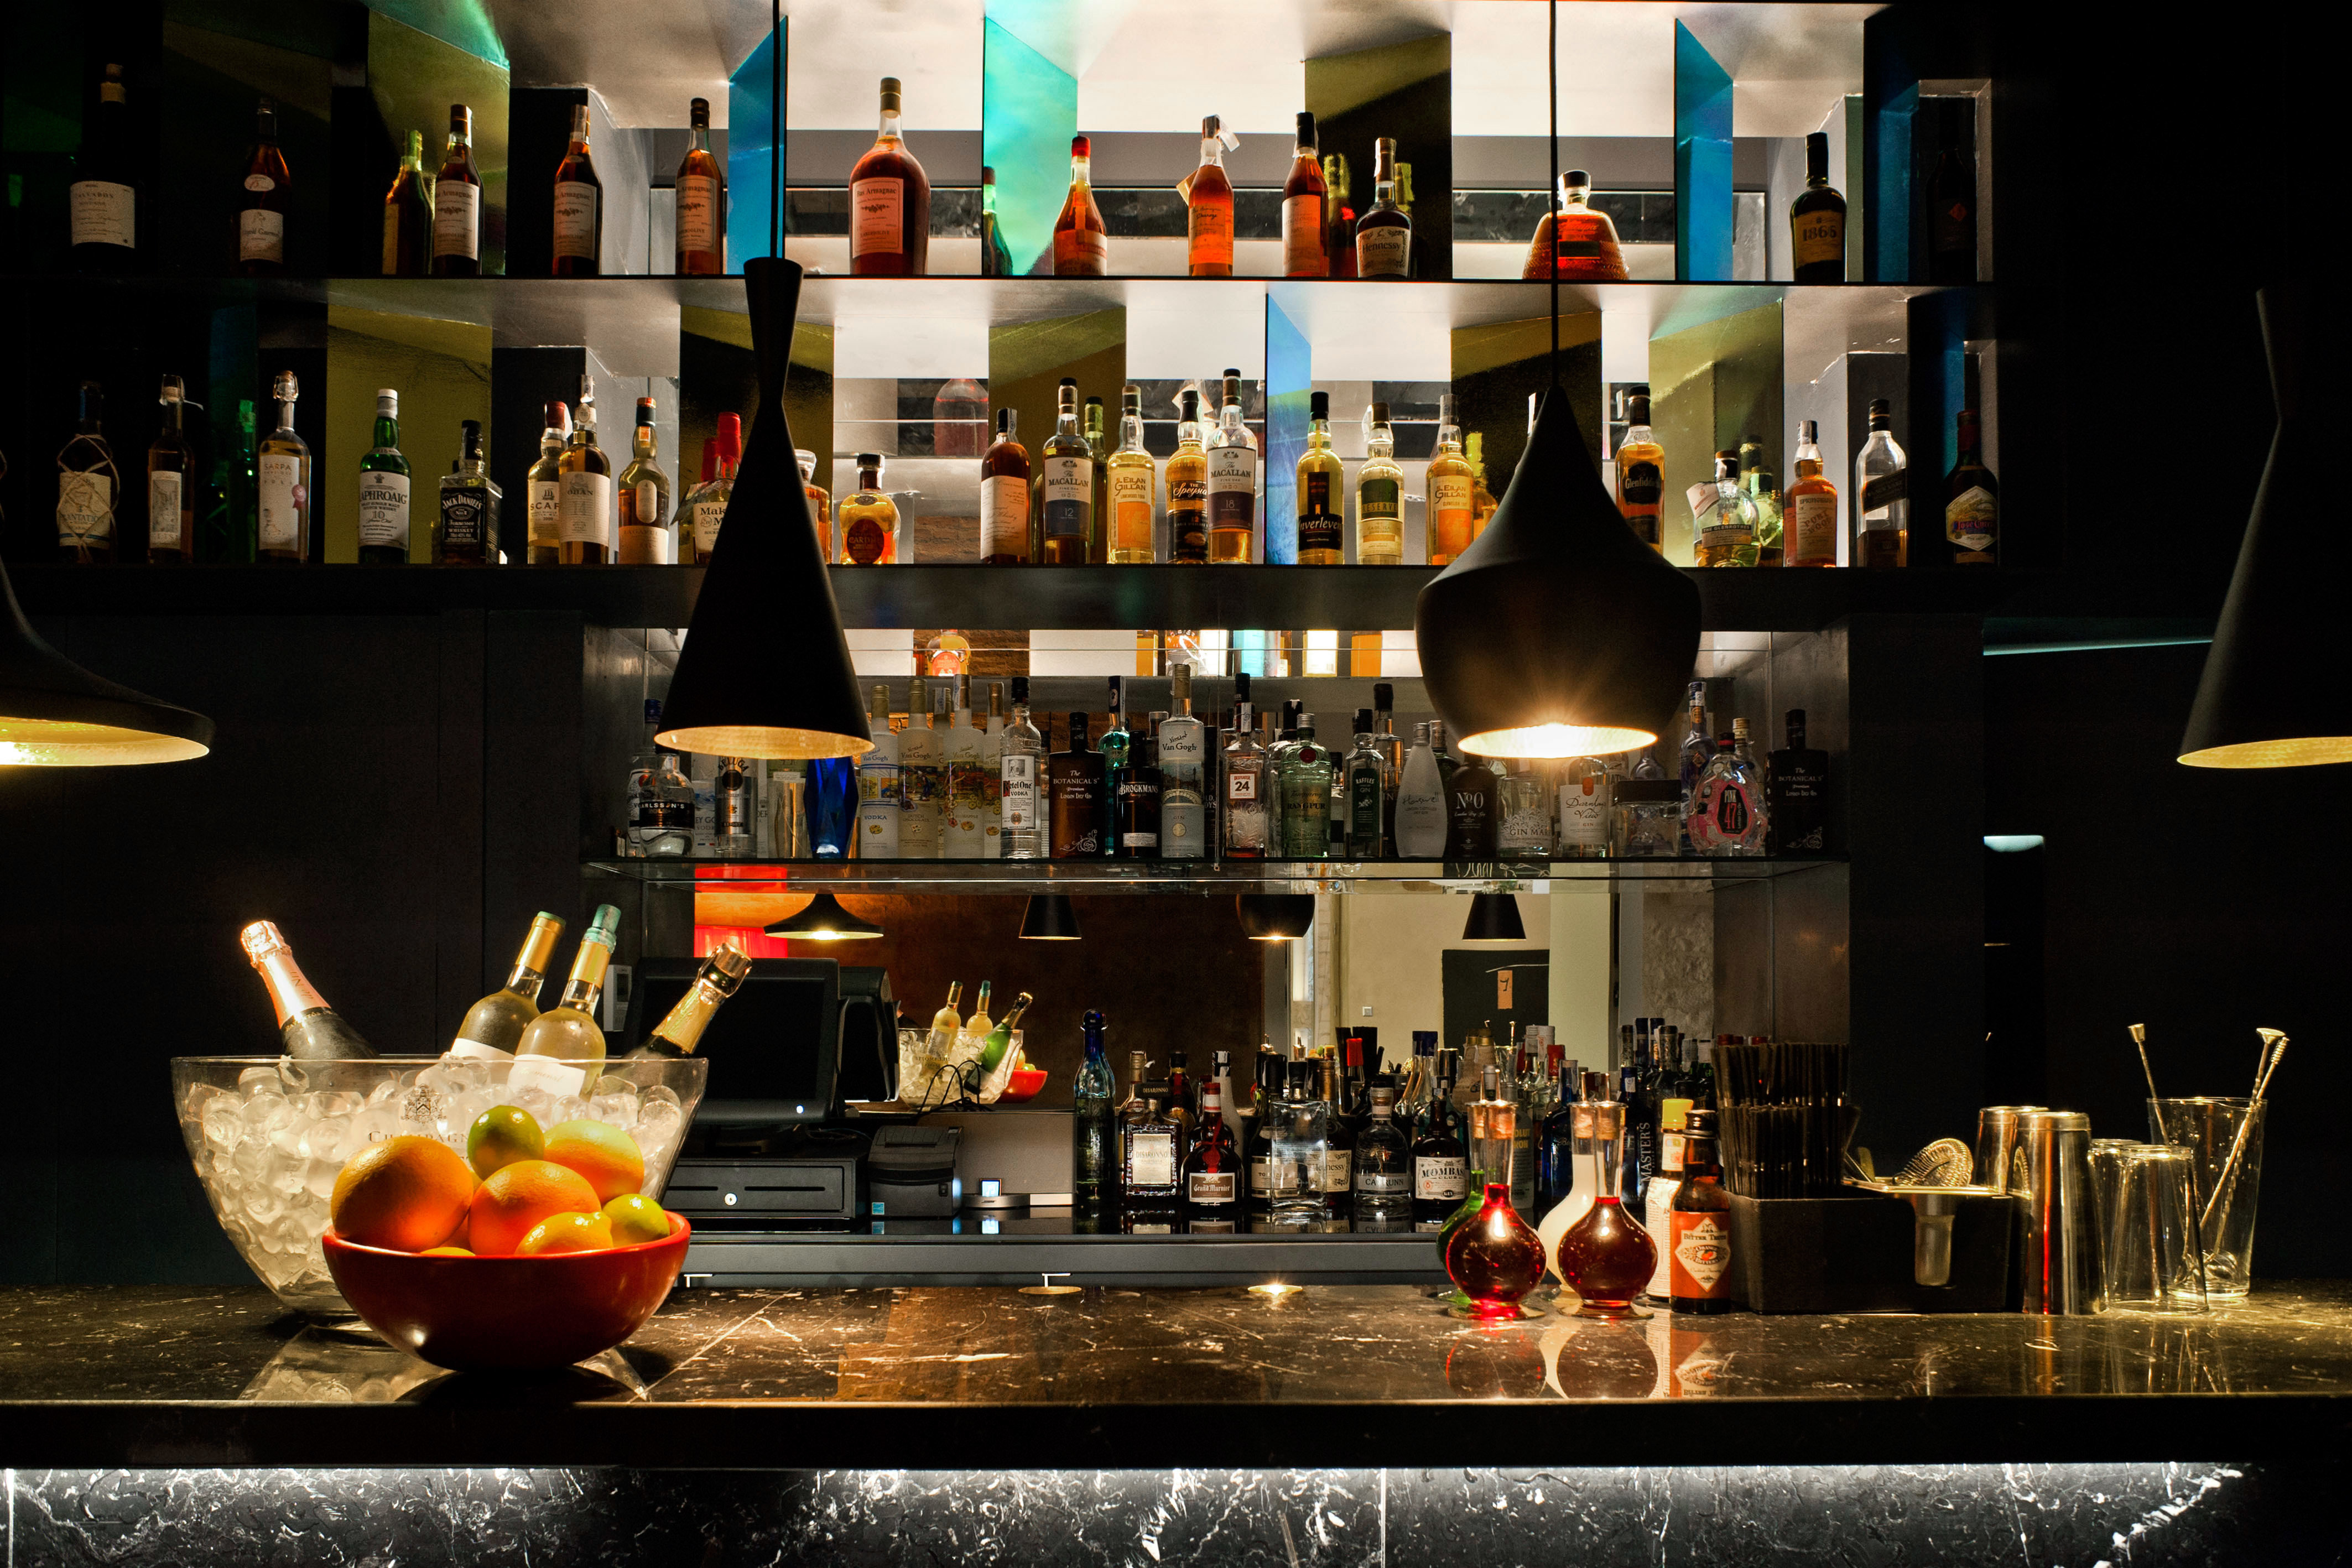 Bar Barcelona Boutique Boutique Hotels City Drink Hip Hotels Luxury Modern Nightlife Spain counter restaurant distilled beverage